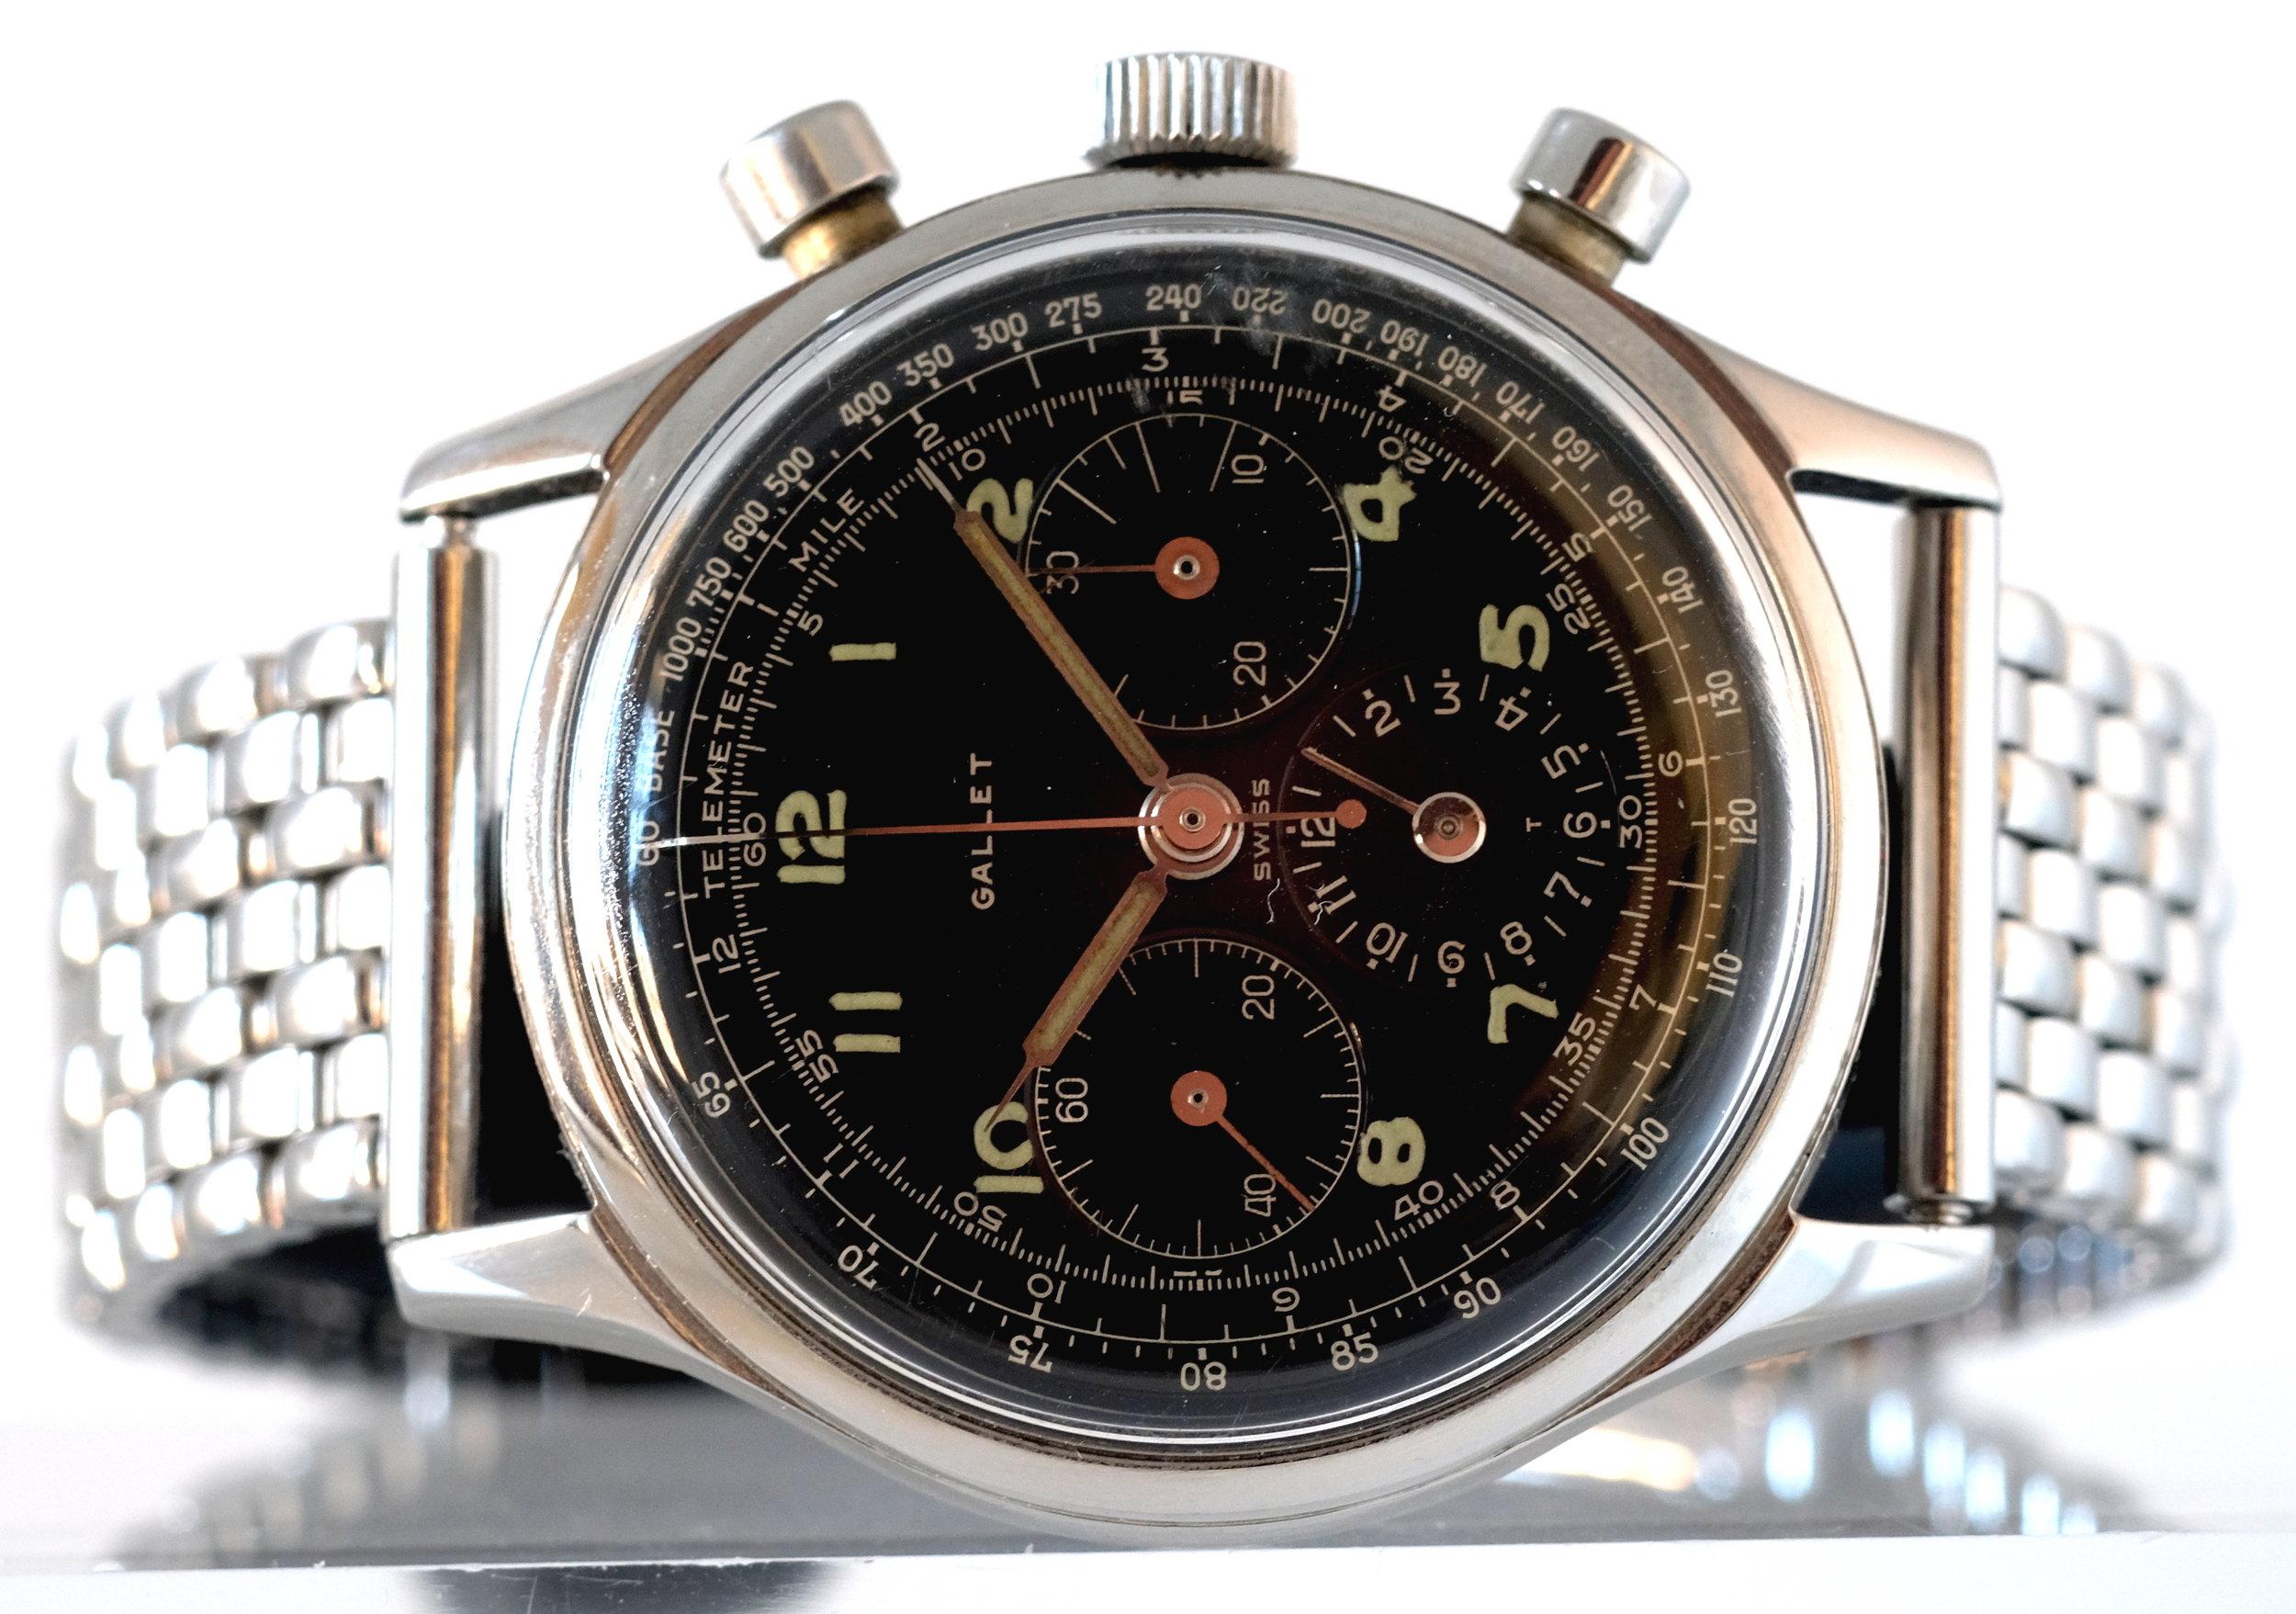 Gallet Multi-Chron Jim Clark Chronograph   SOLD